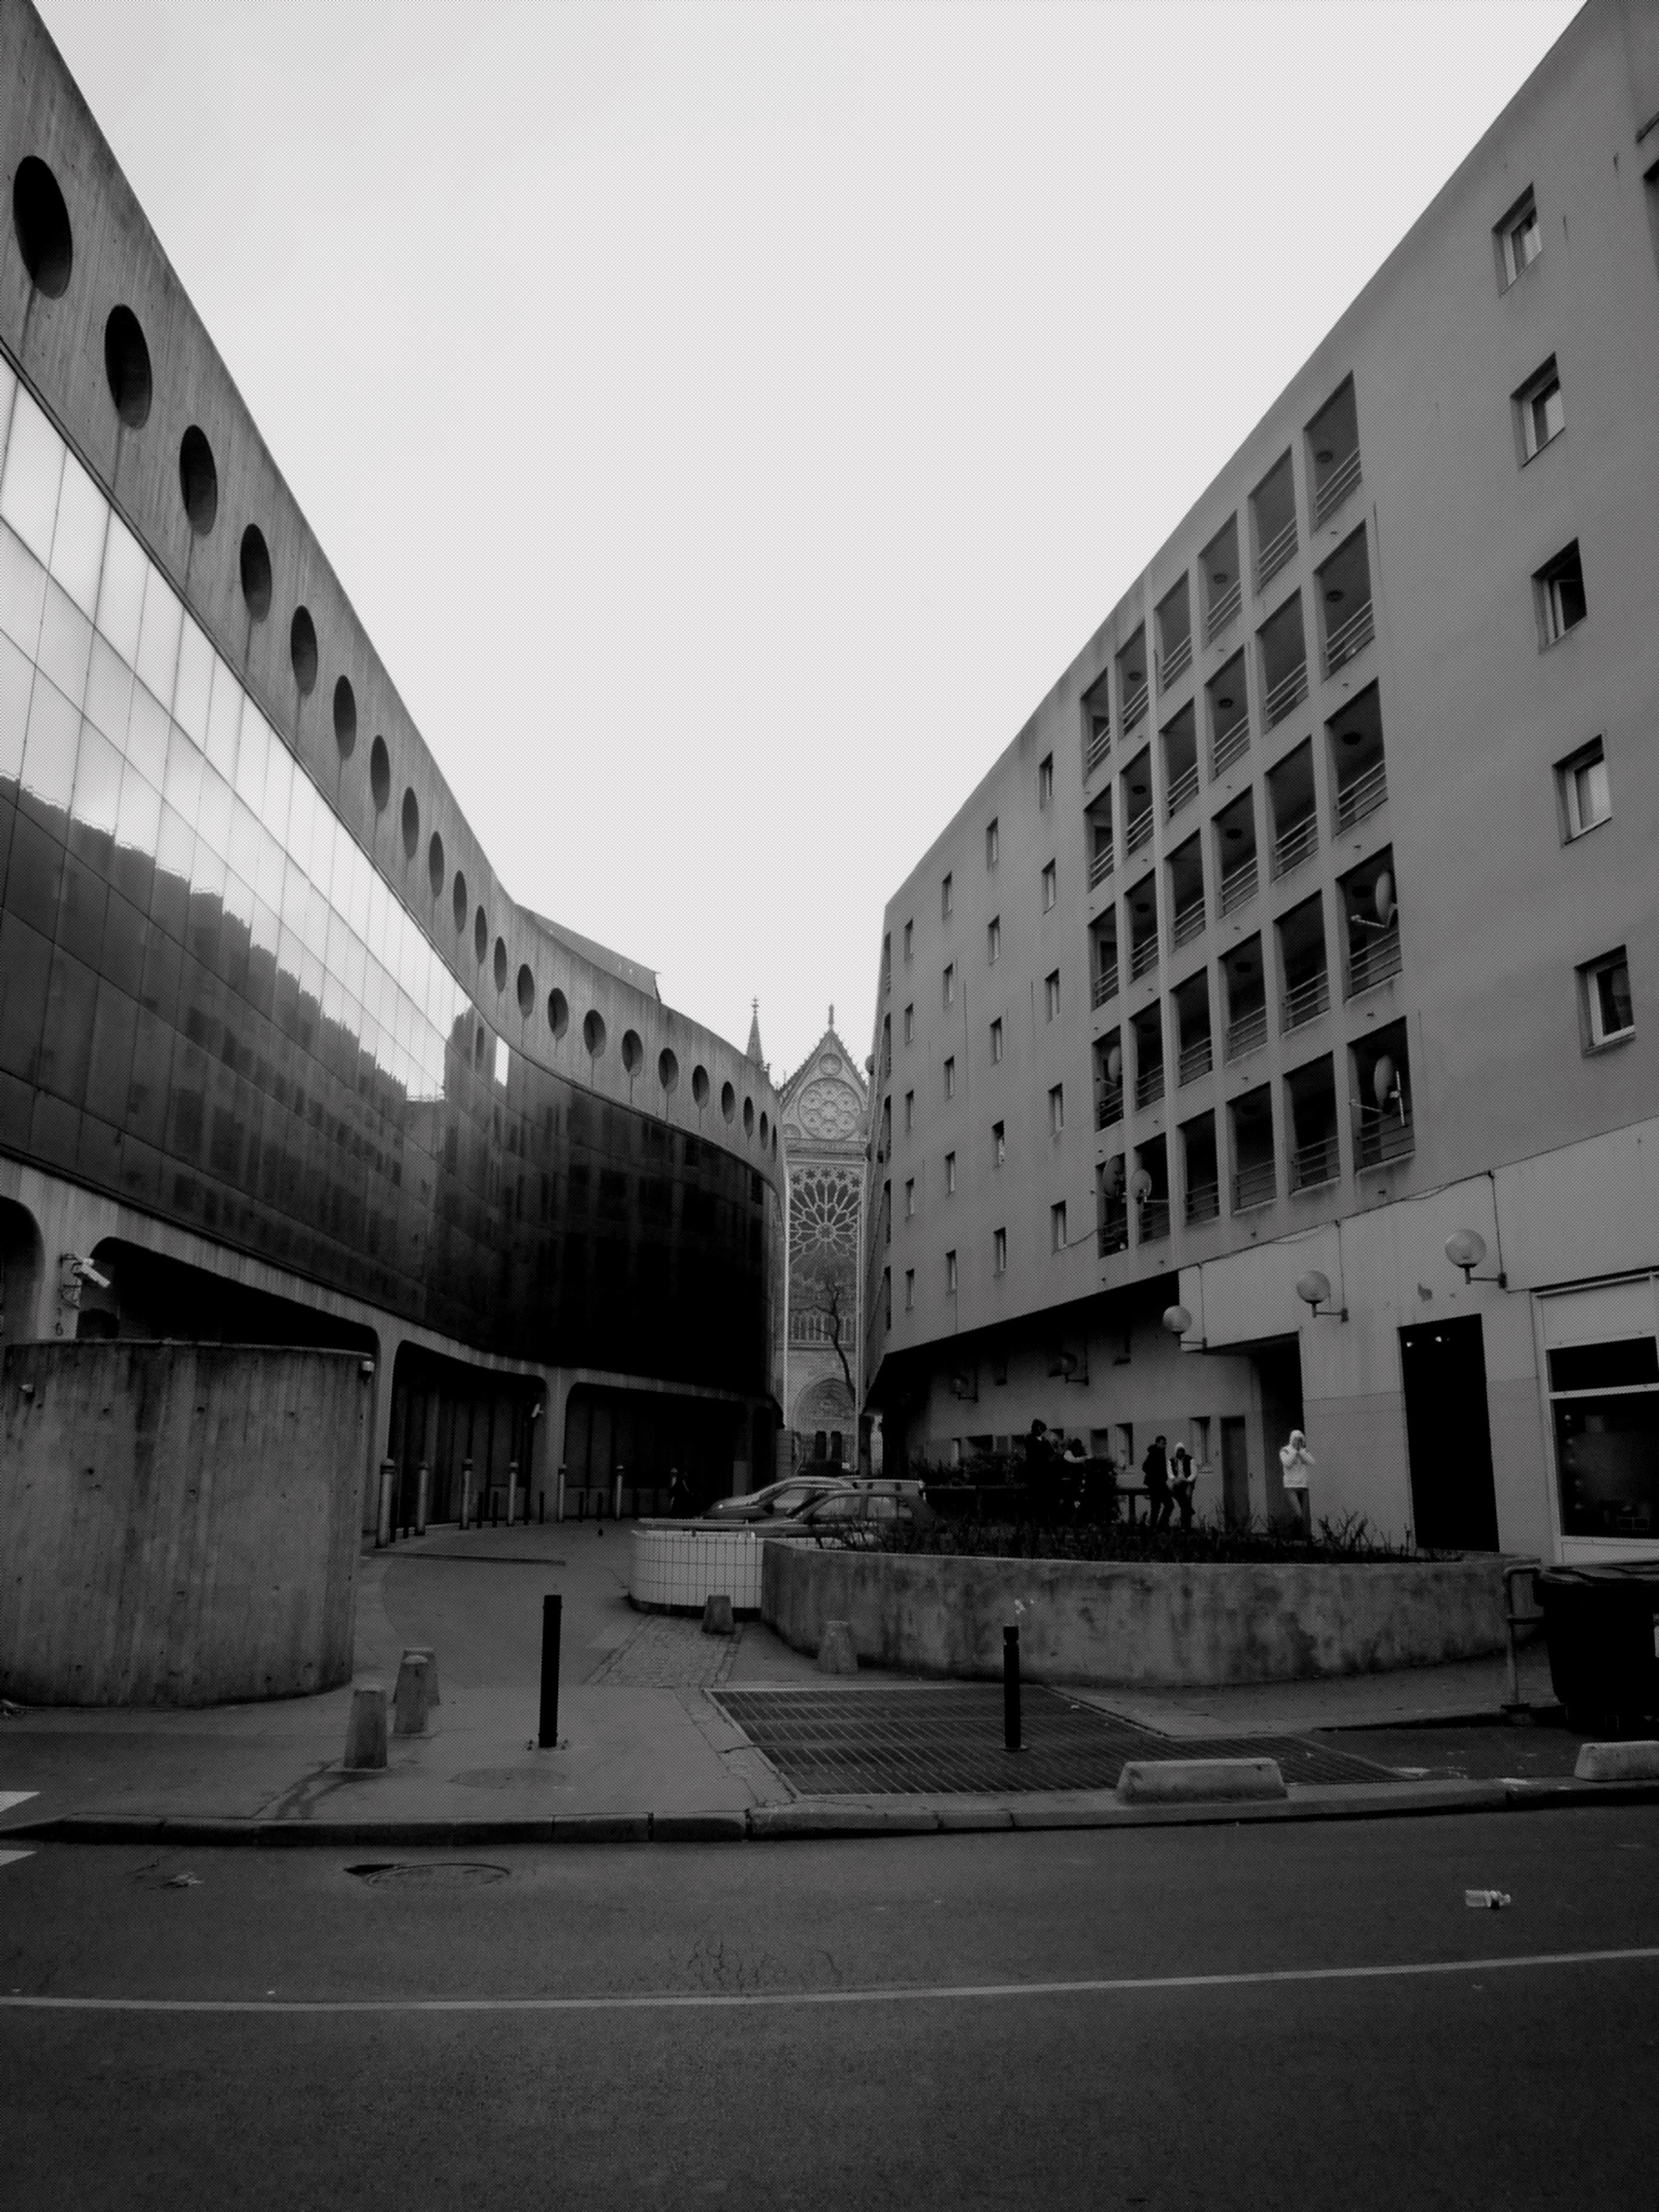 Photo in Saint-Denis by Guglielmo Mangilli